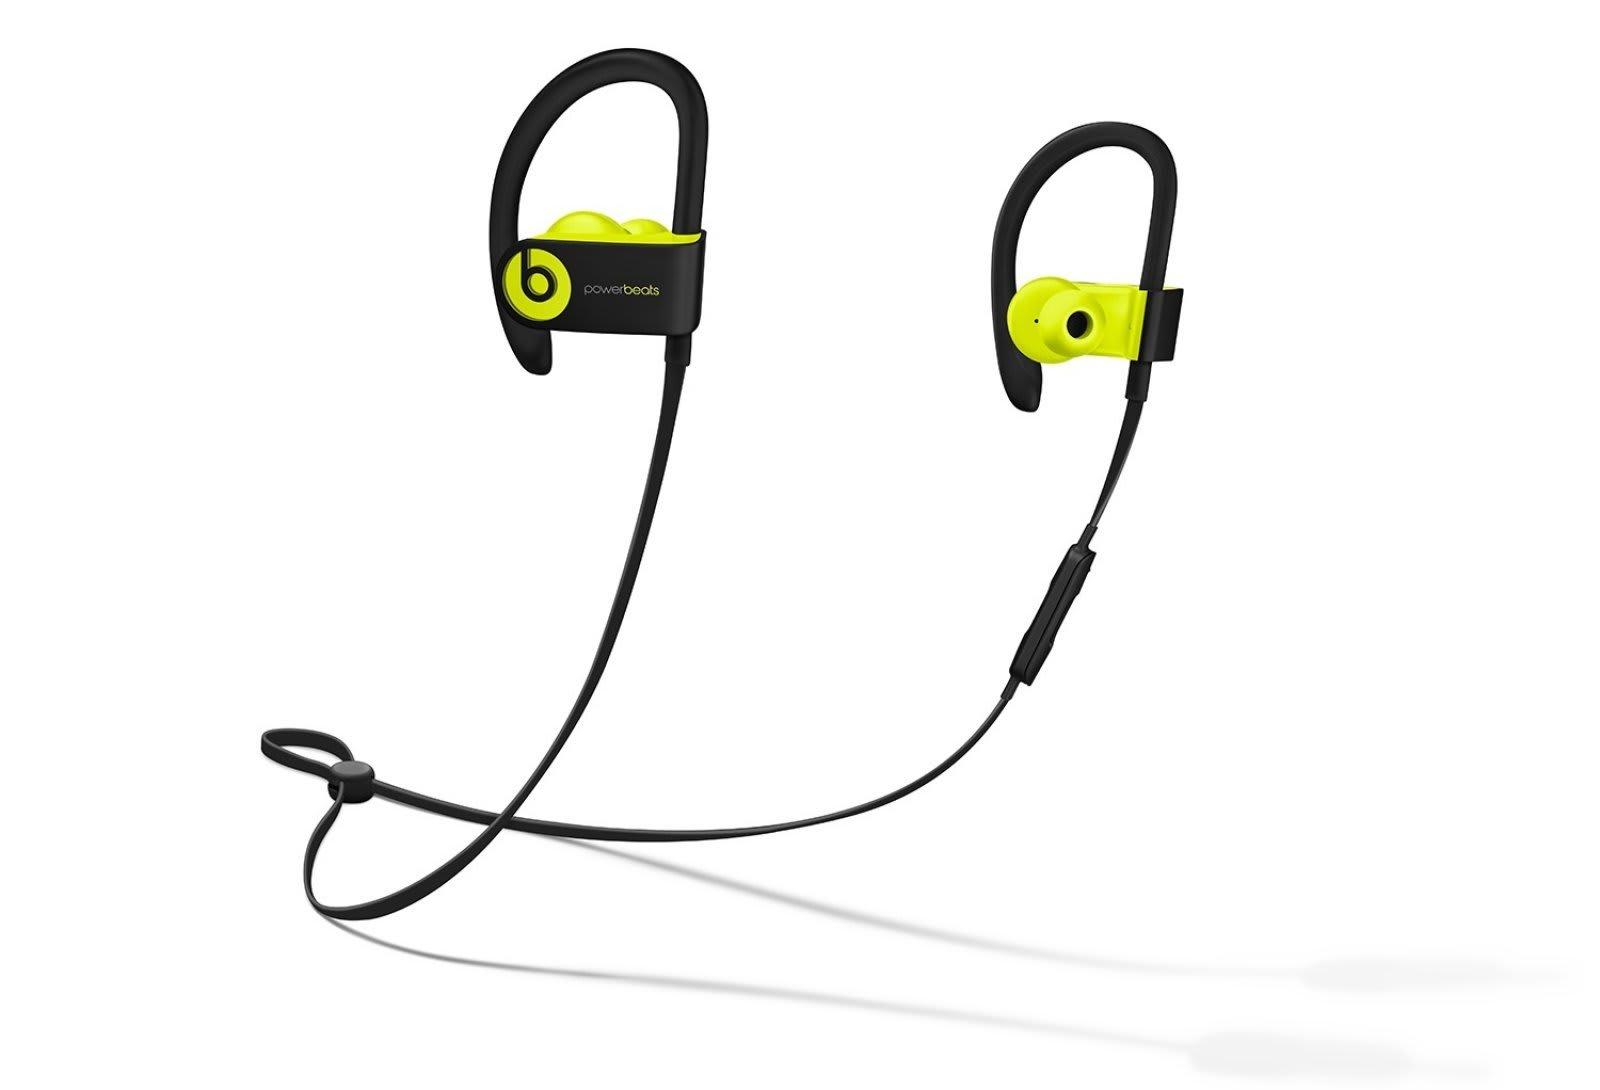 2f015b4473c931 Beatsブランドで完全ワイヤレスイヤホンが4月発売?新AirPodsと同じH1チップ搭載、Hey Siri対応のうわさ - Engadget 日本版